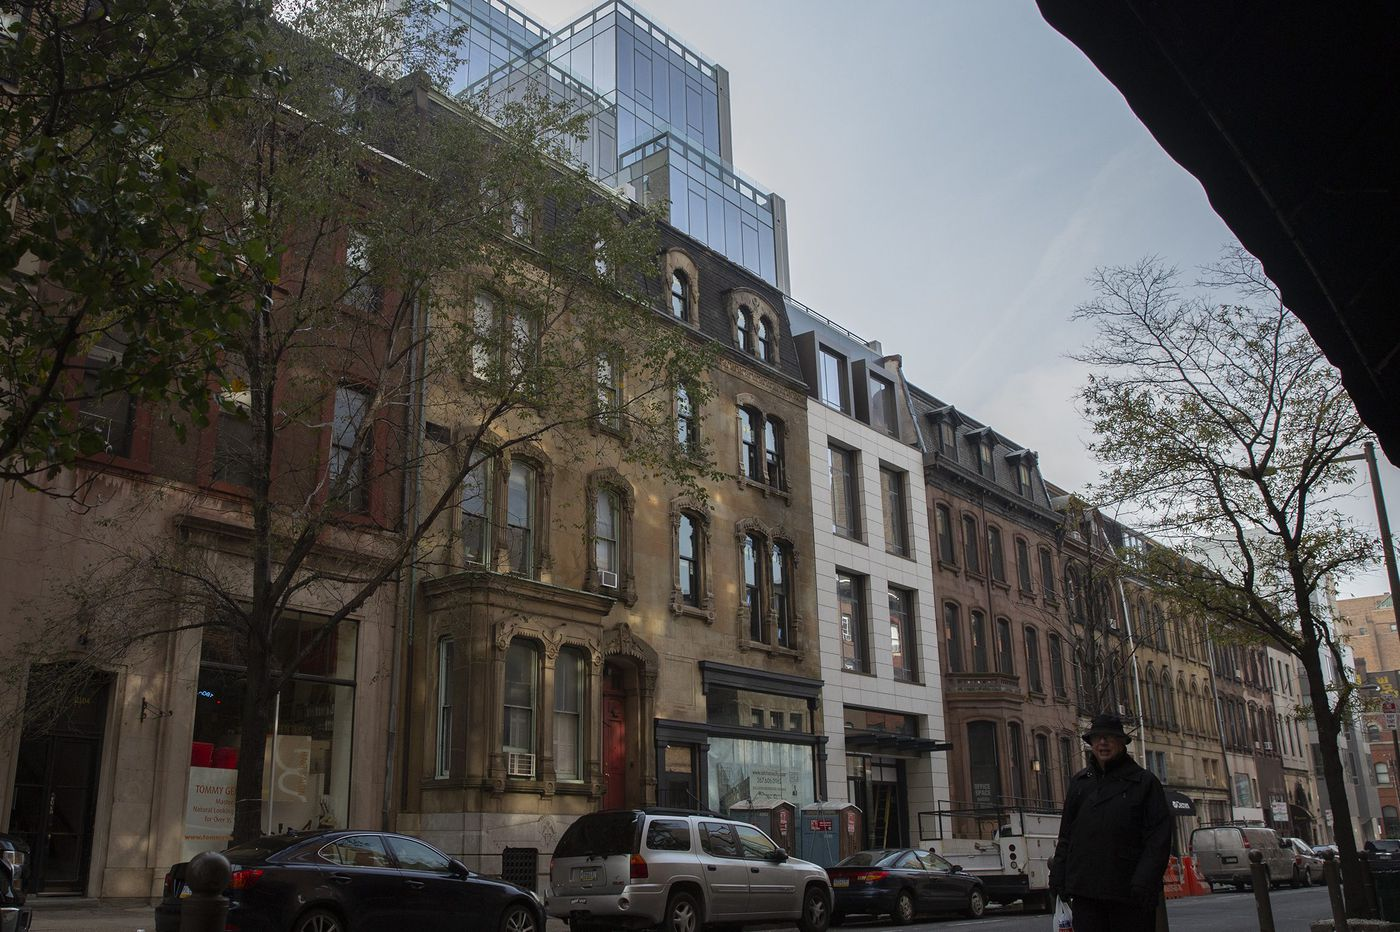 The new Frankenstein condos of Rittenhouse Square